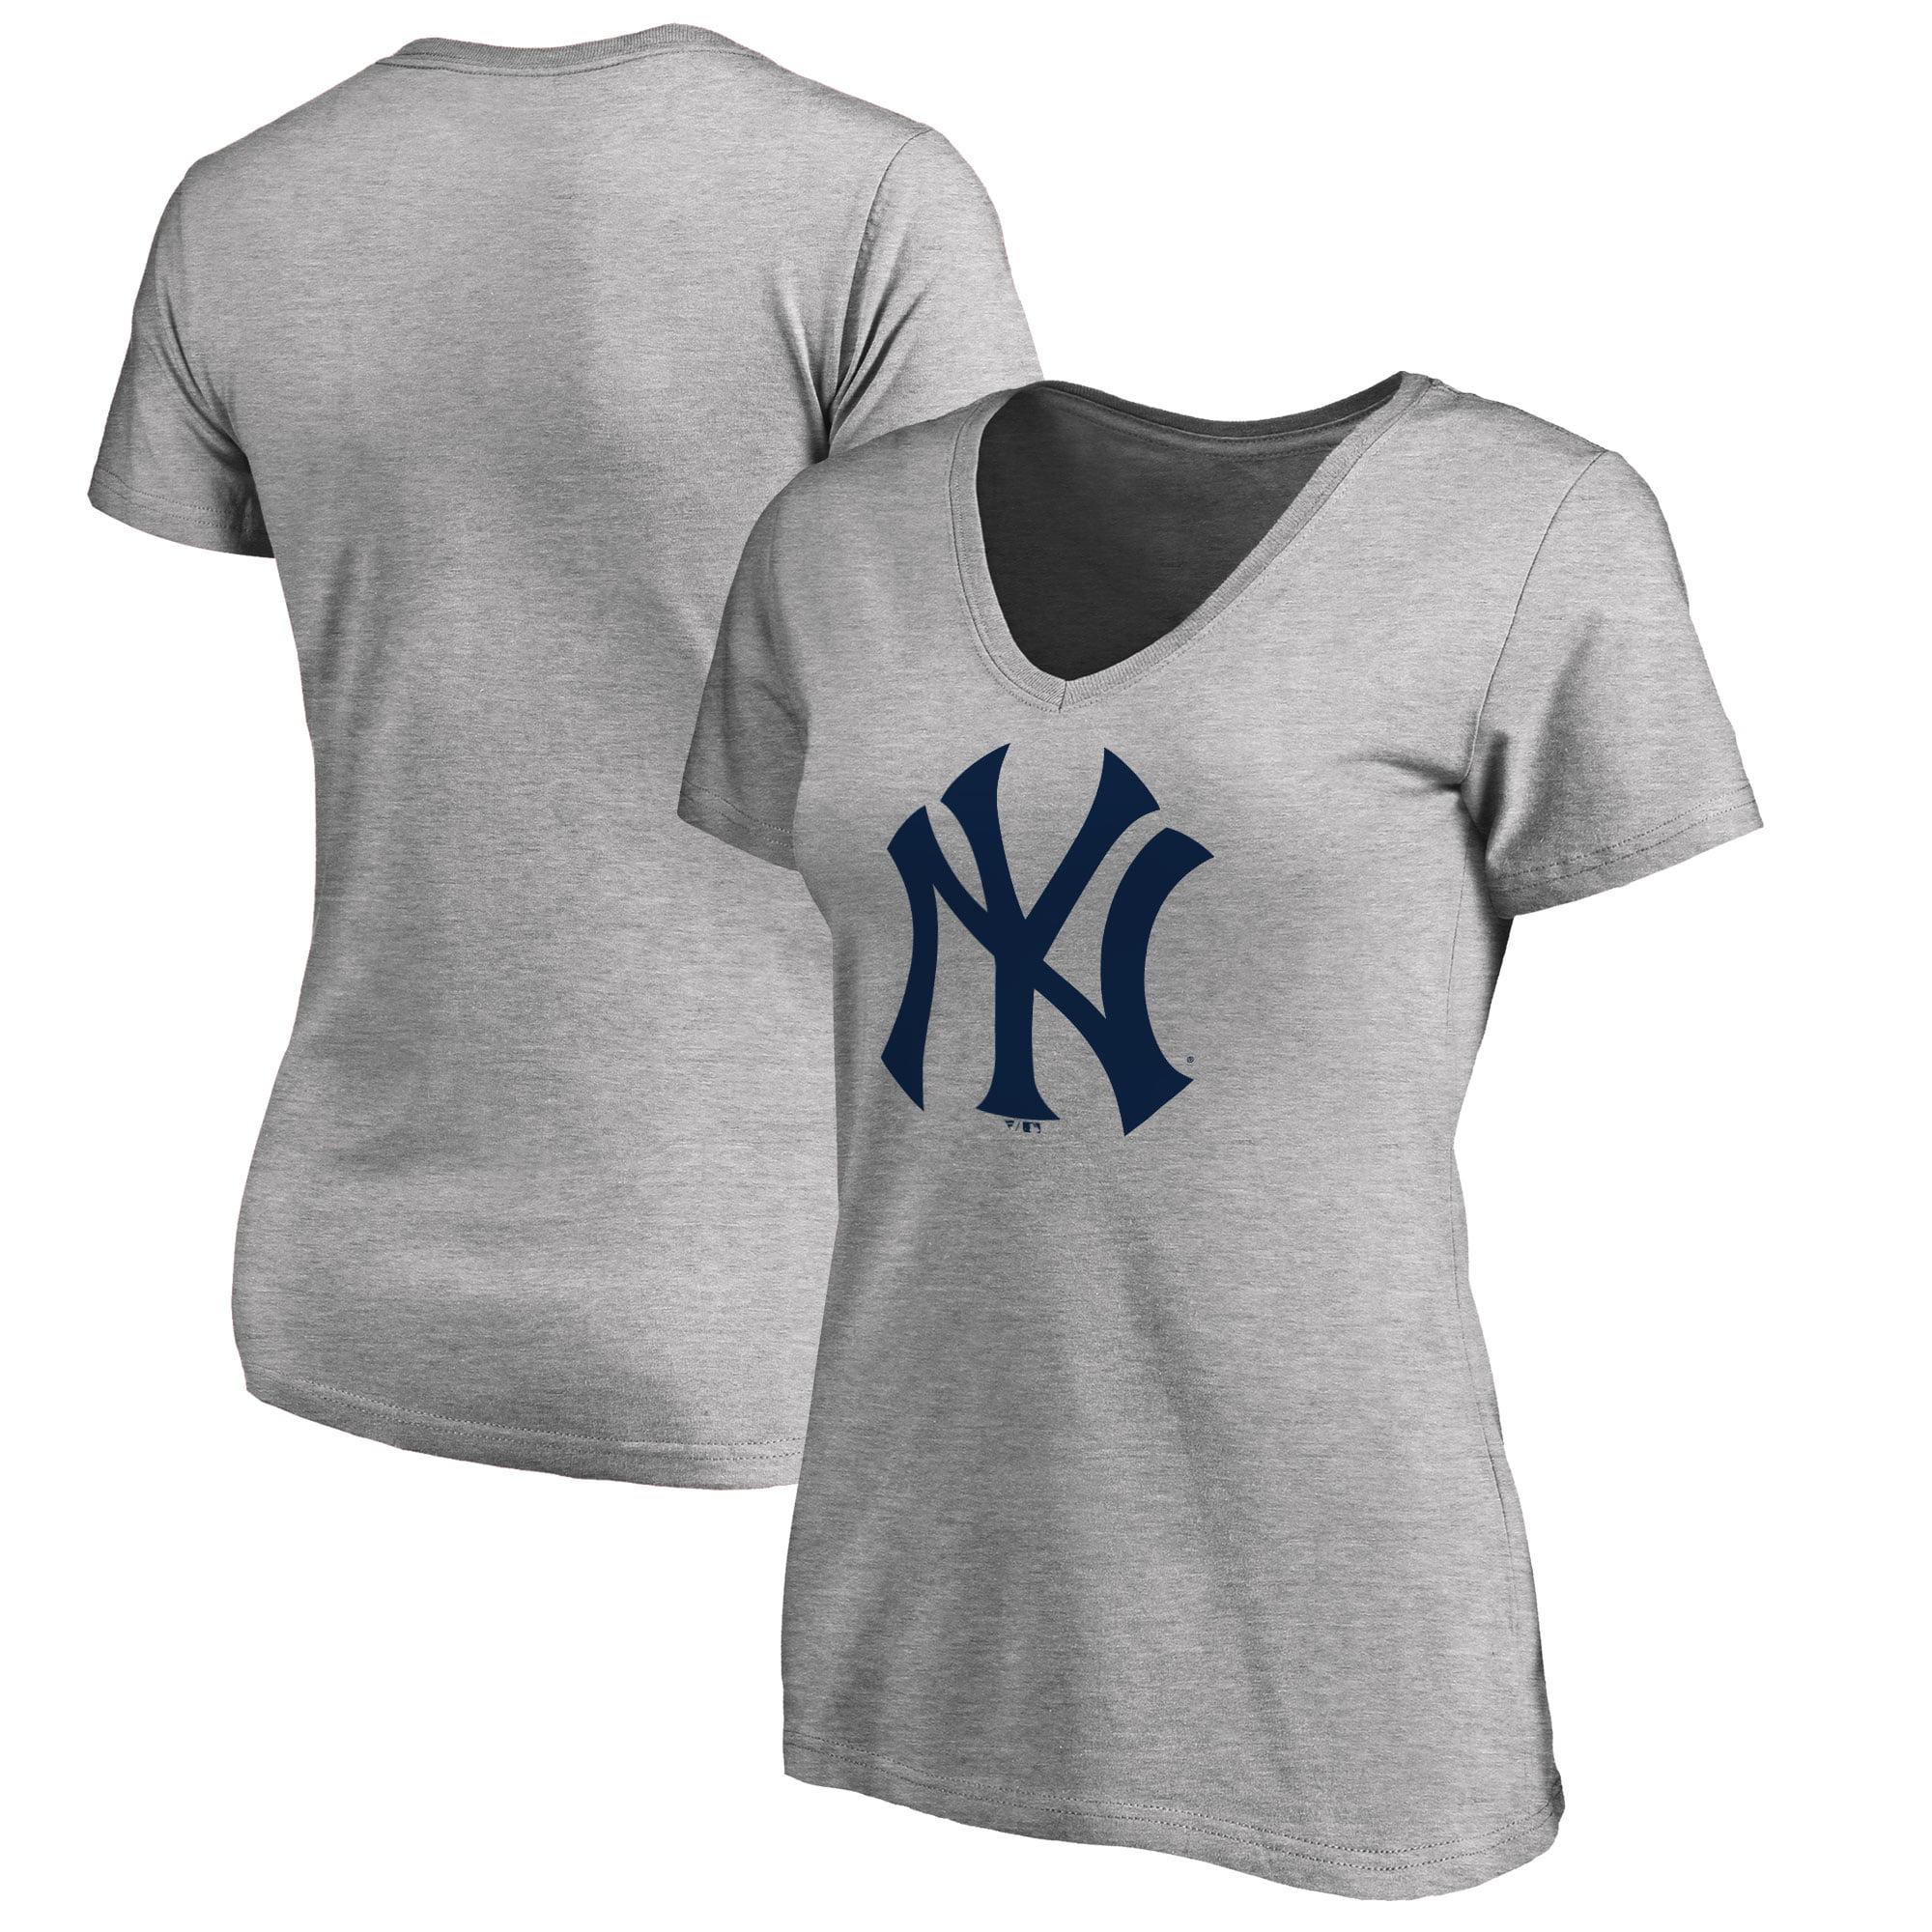 New York Yankees Women's Plus Sizes Primary Team Logo T-Shirt - Ash